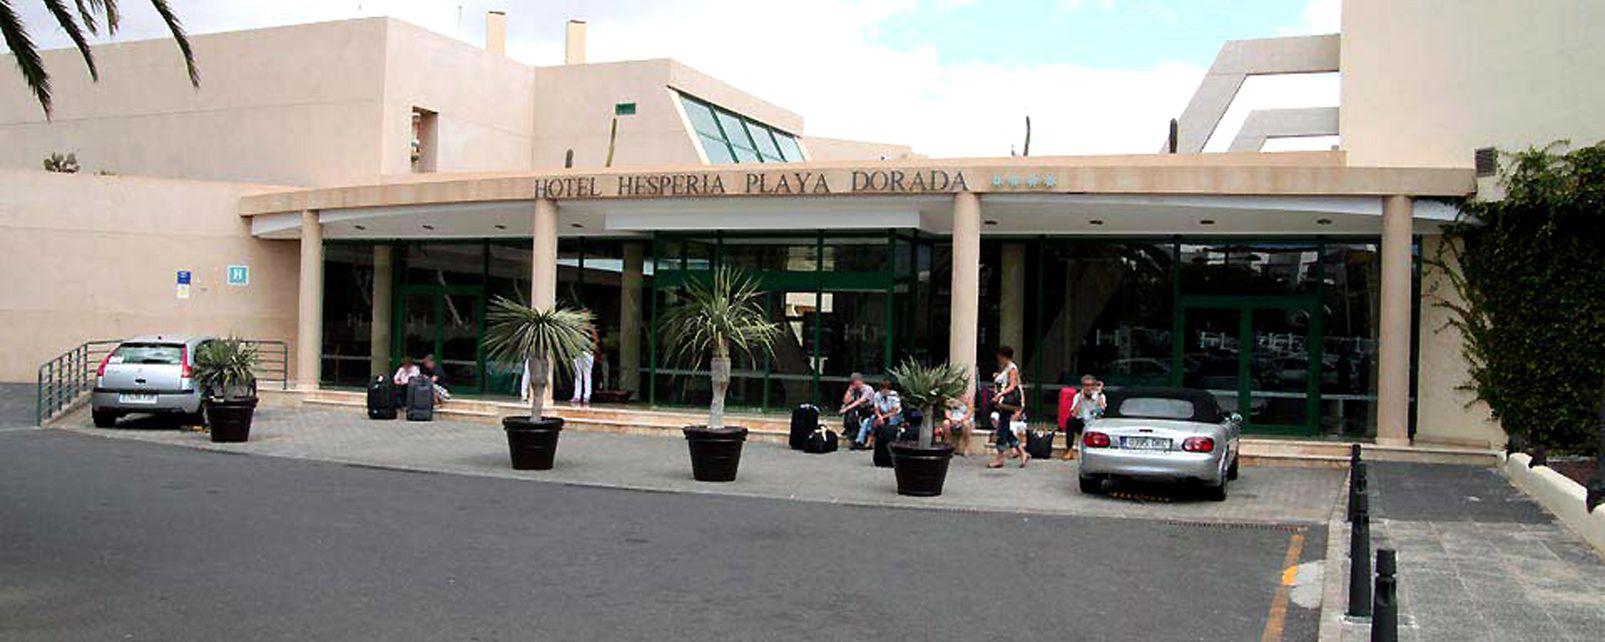 Hôtel Hesperia Playa Dorada